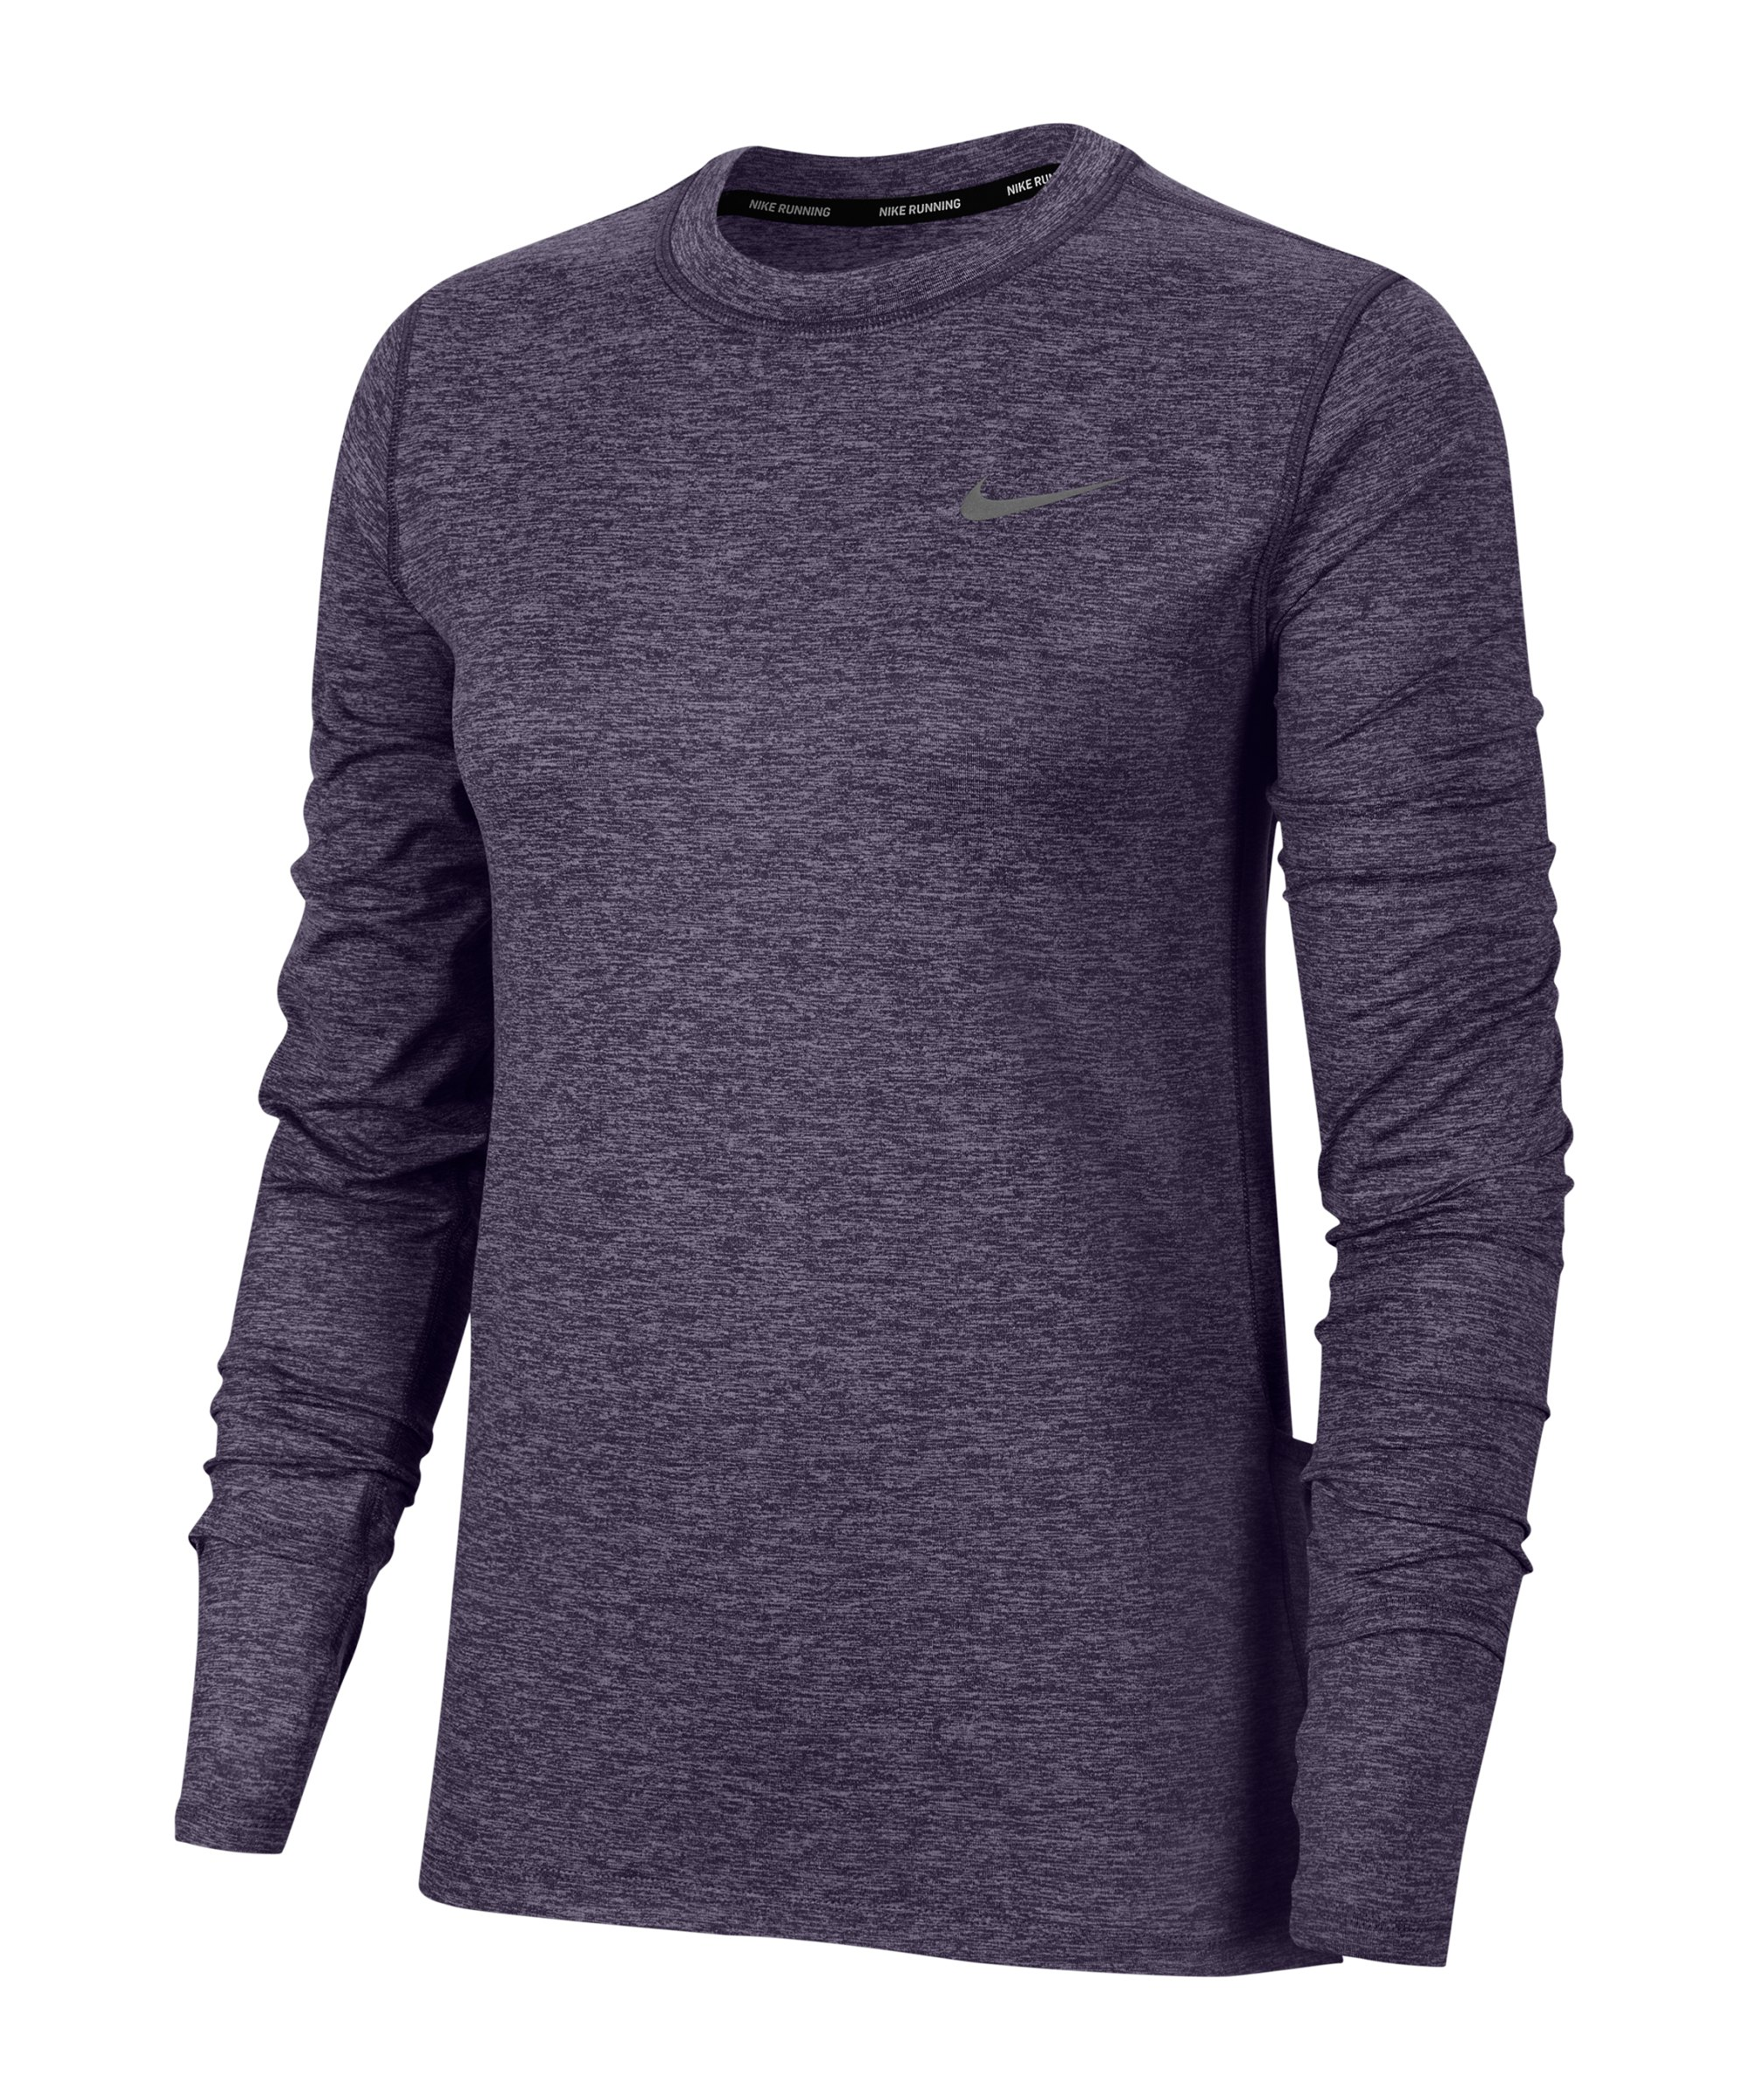 Nike Element Crew Sweatshirt Running Damen F573 - lila